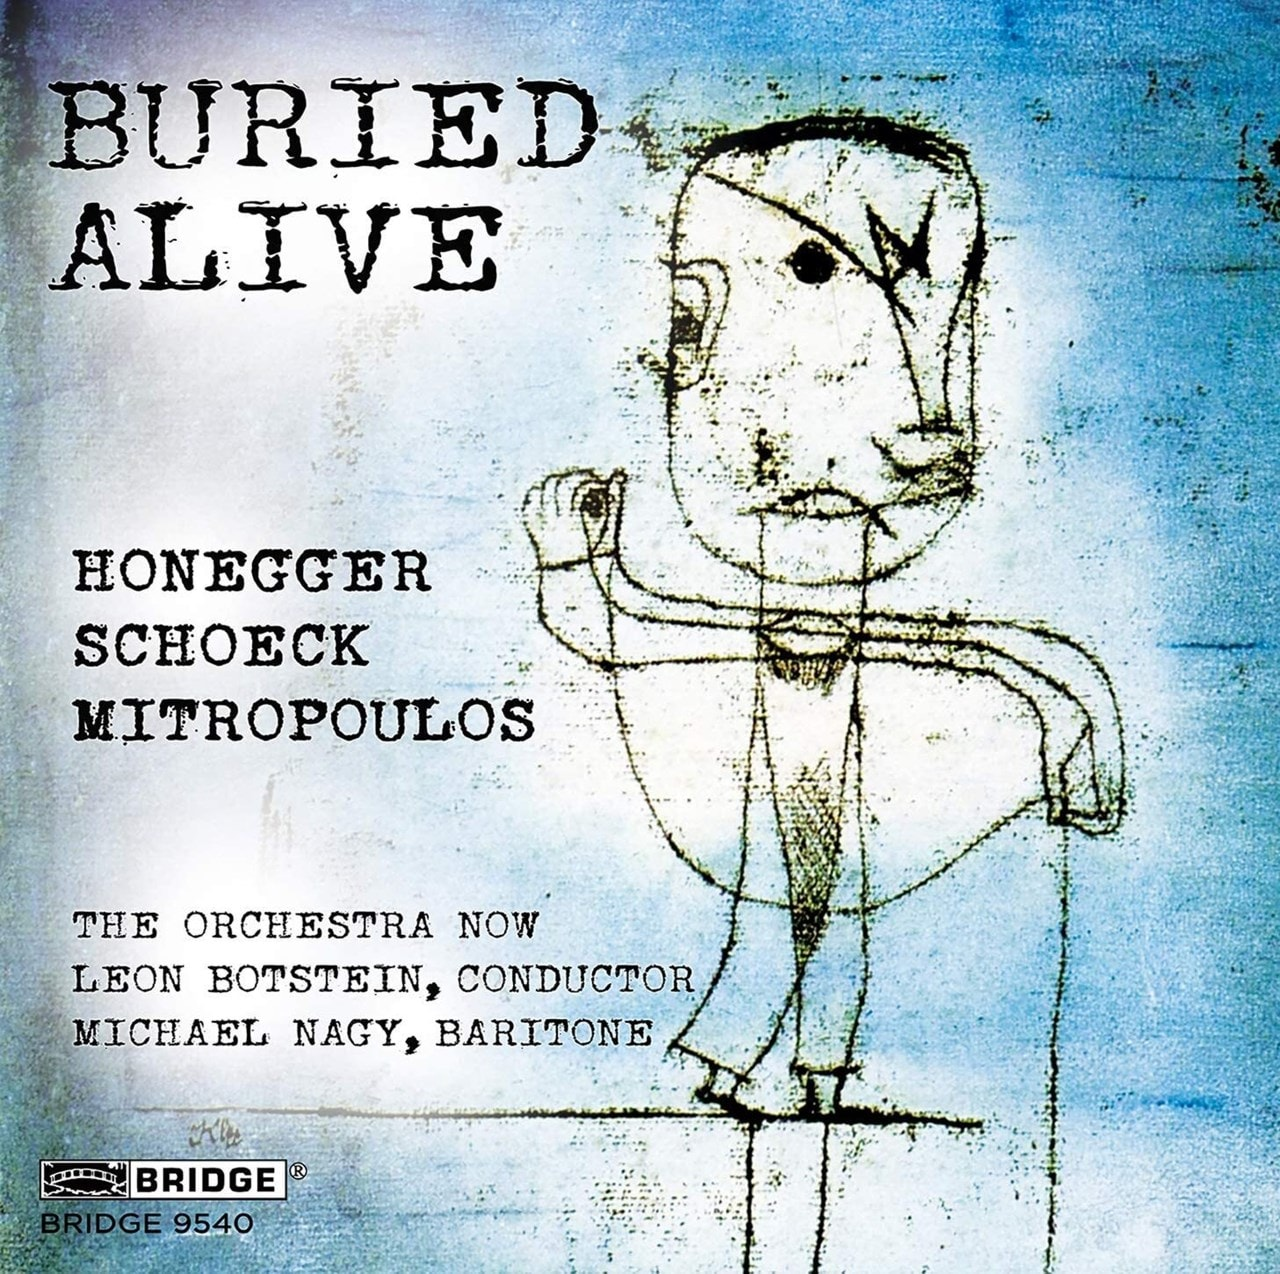 Honegger/Schoeck/Mitropoulos: Buried Alive - 1